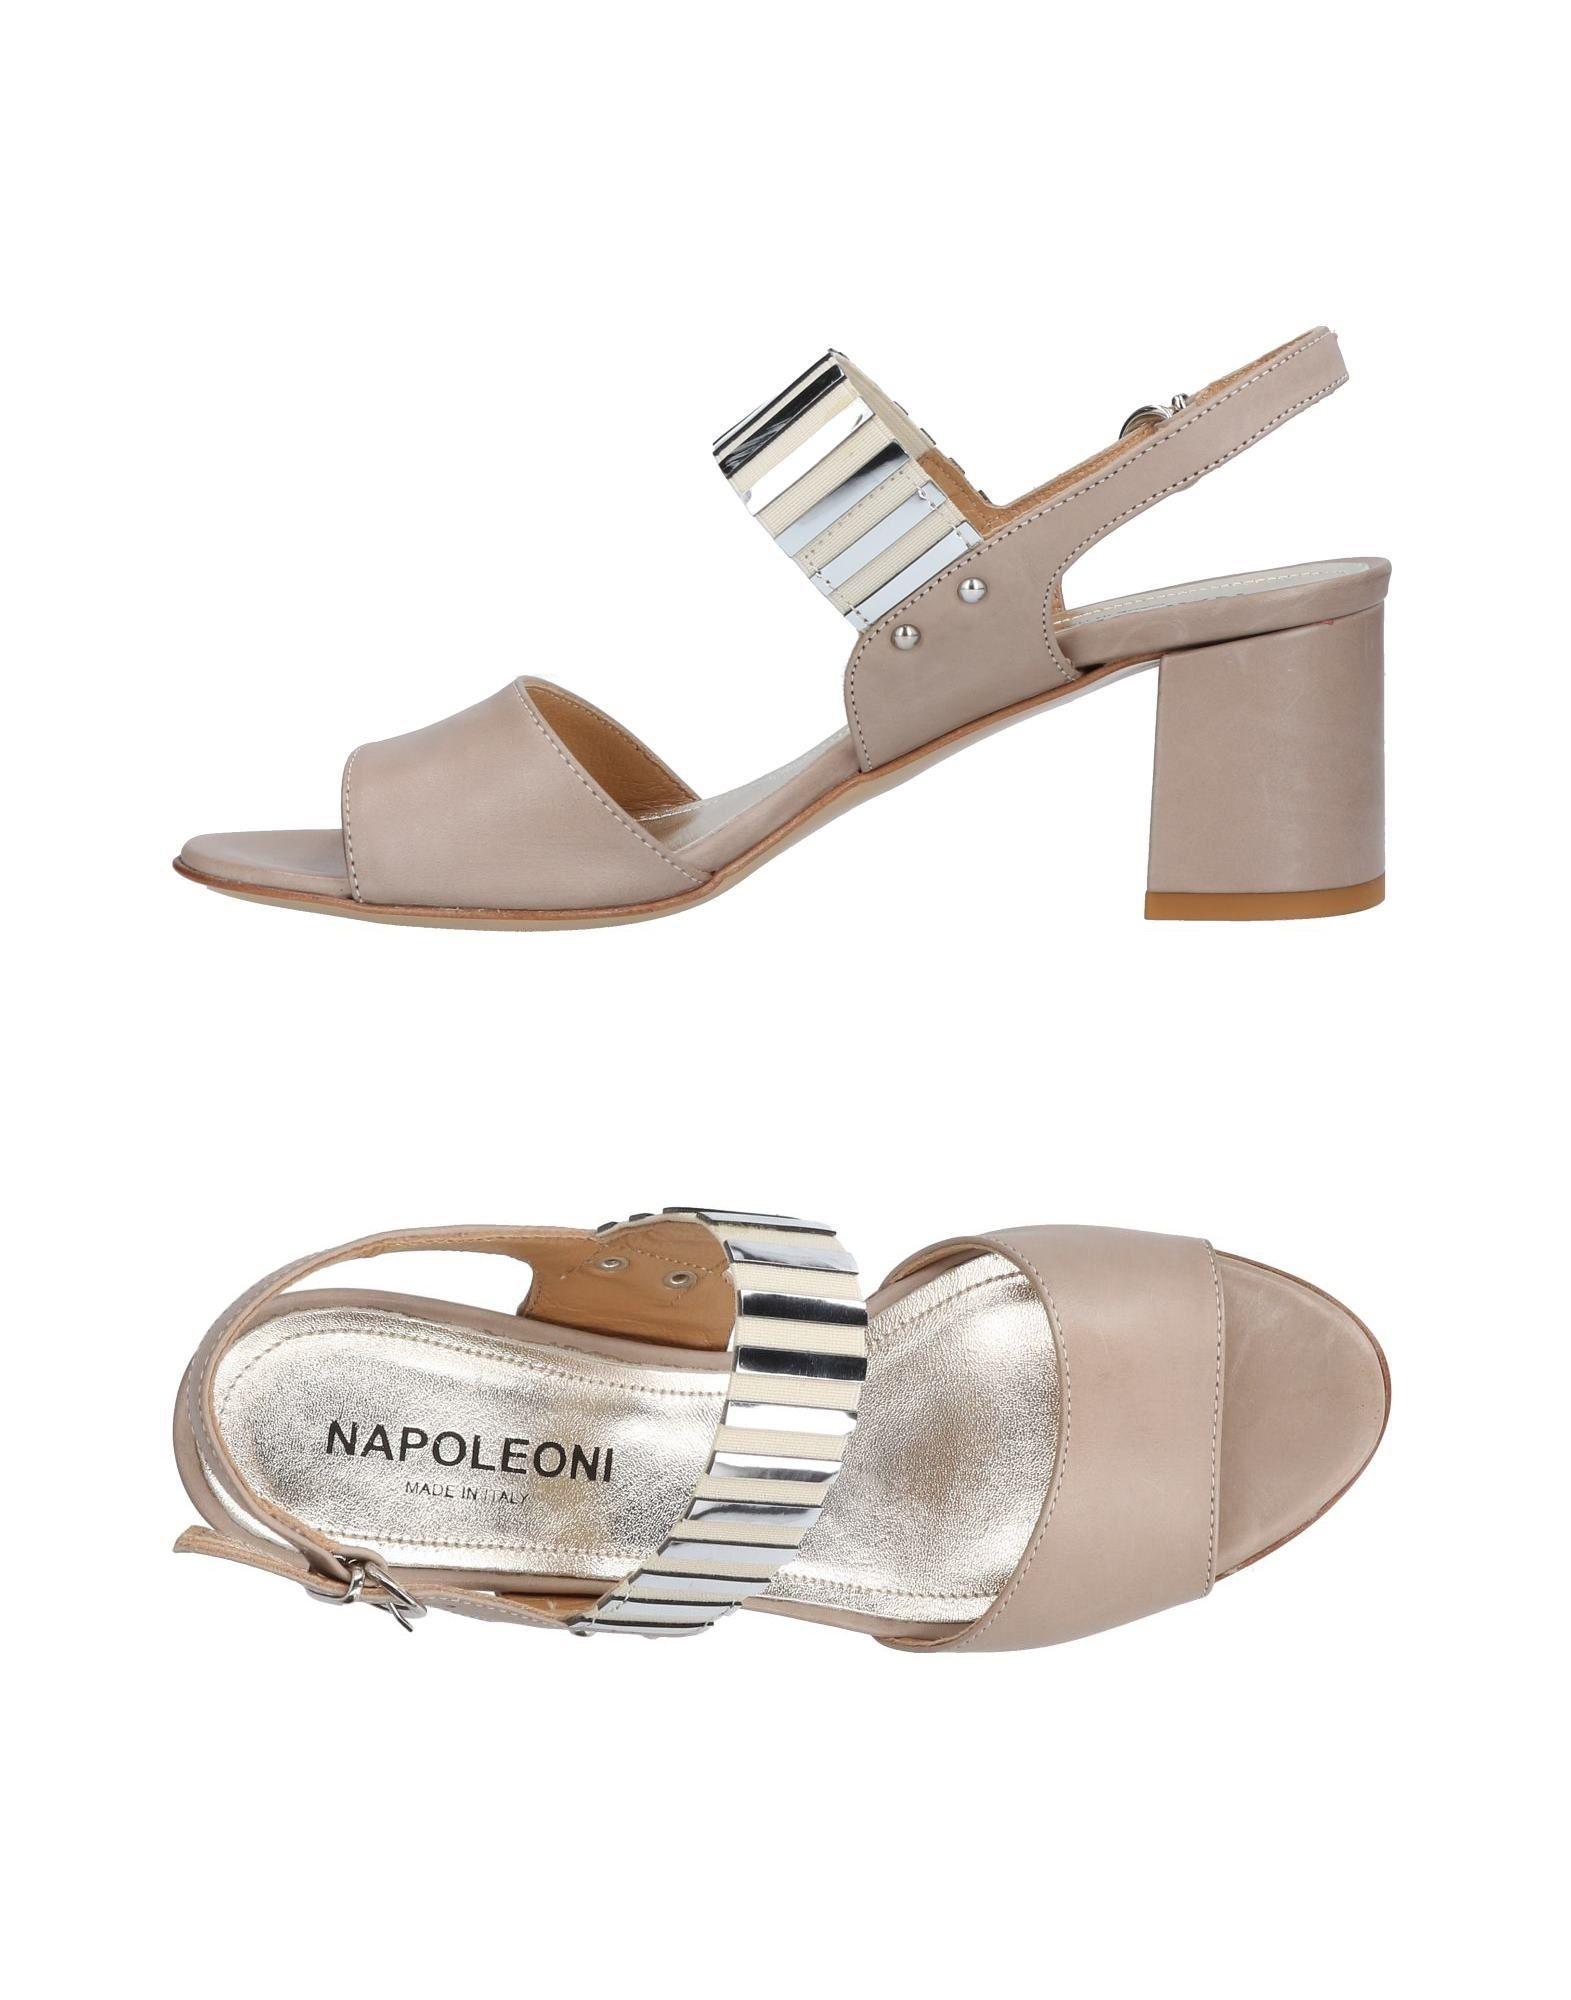 Moda Sandali Napoleoni Donna Donna Napoleoni - 11464701CF 9feeeb